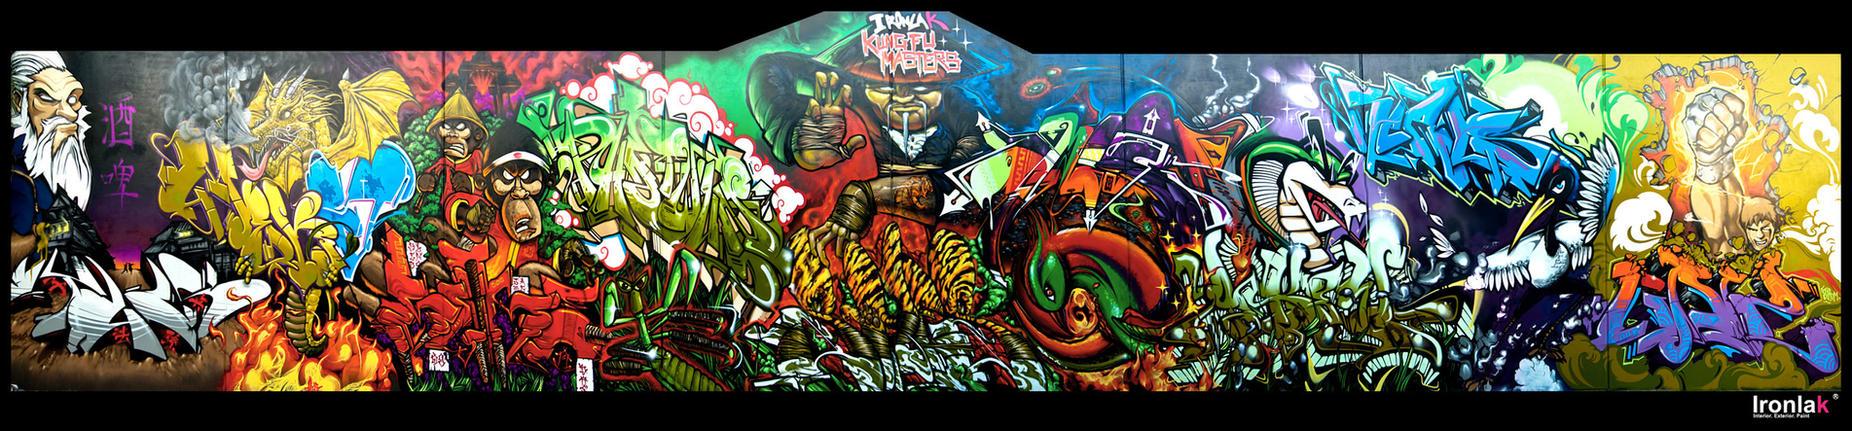 IRONLAK KUNG FU MASTERS by EL3RD